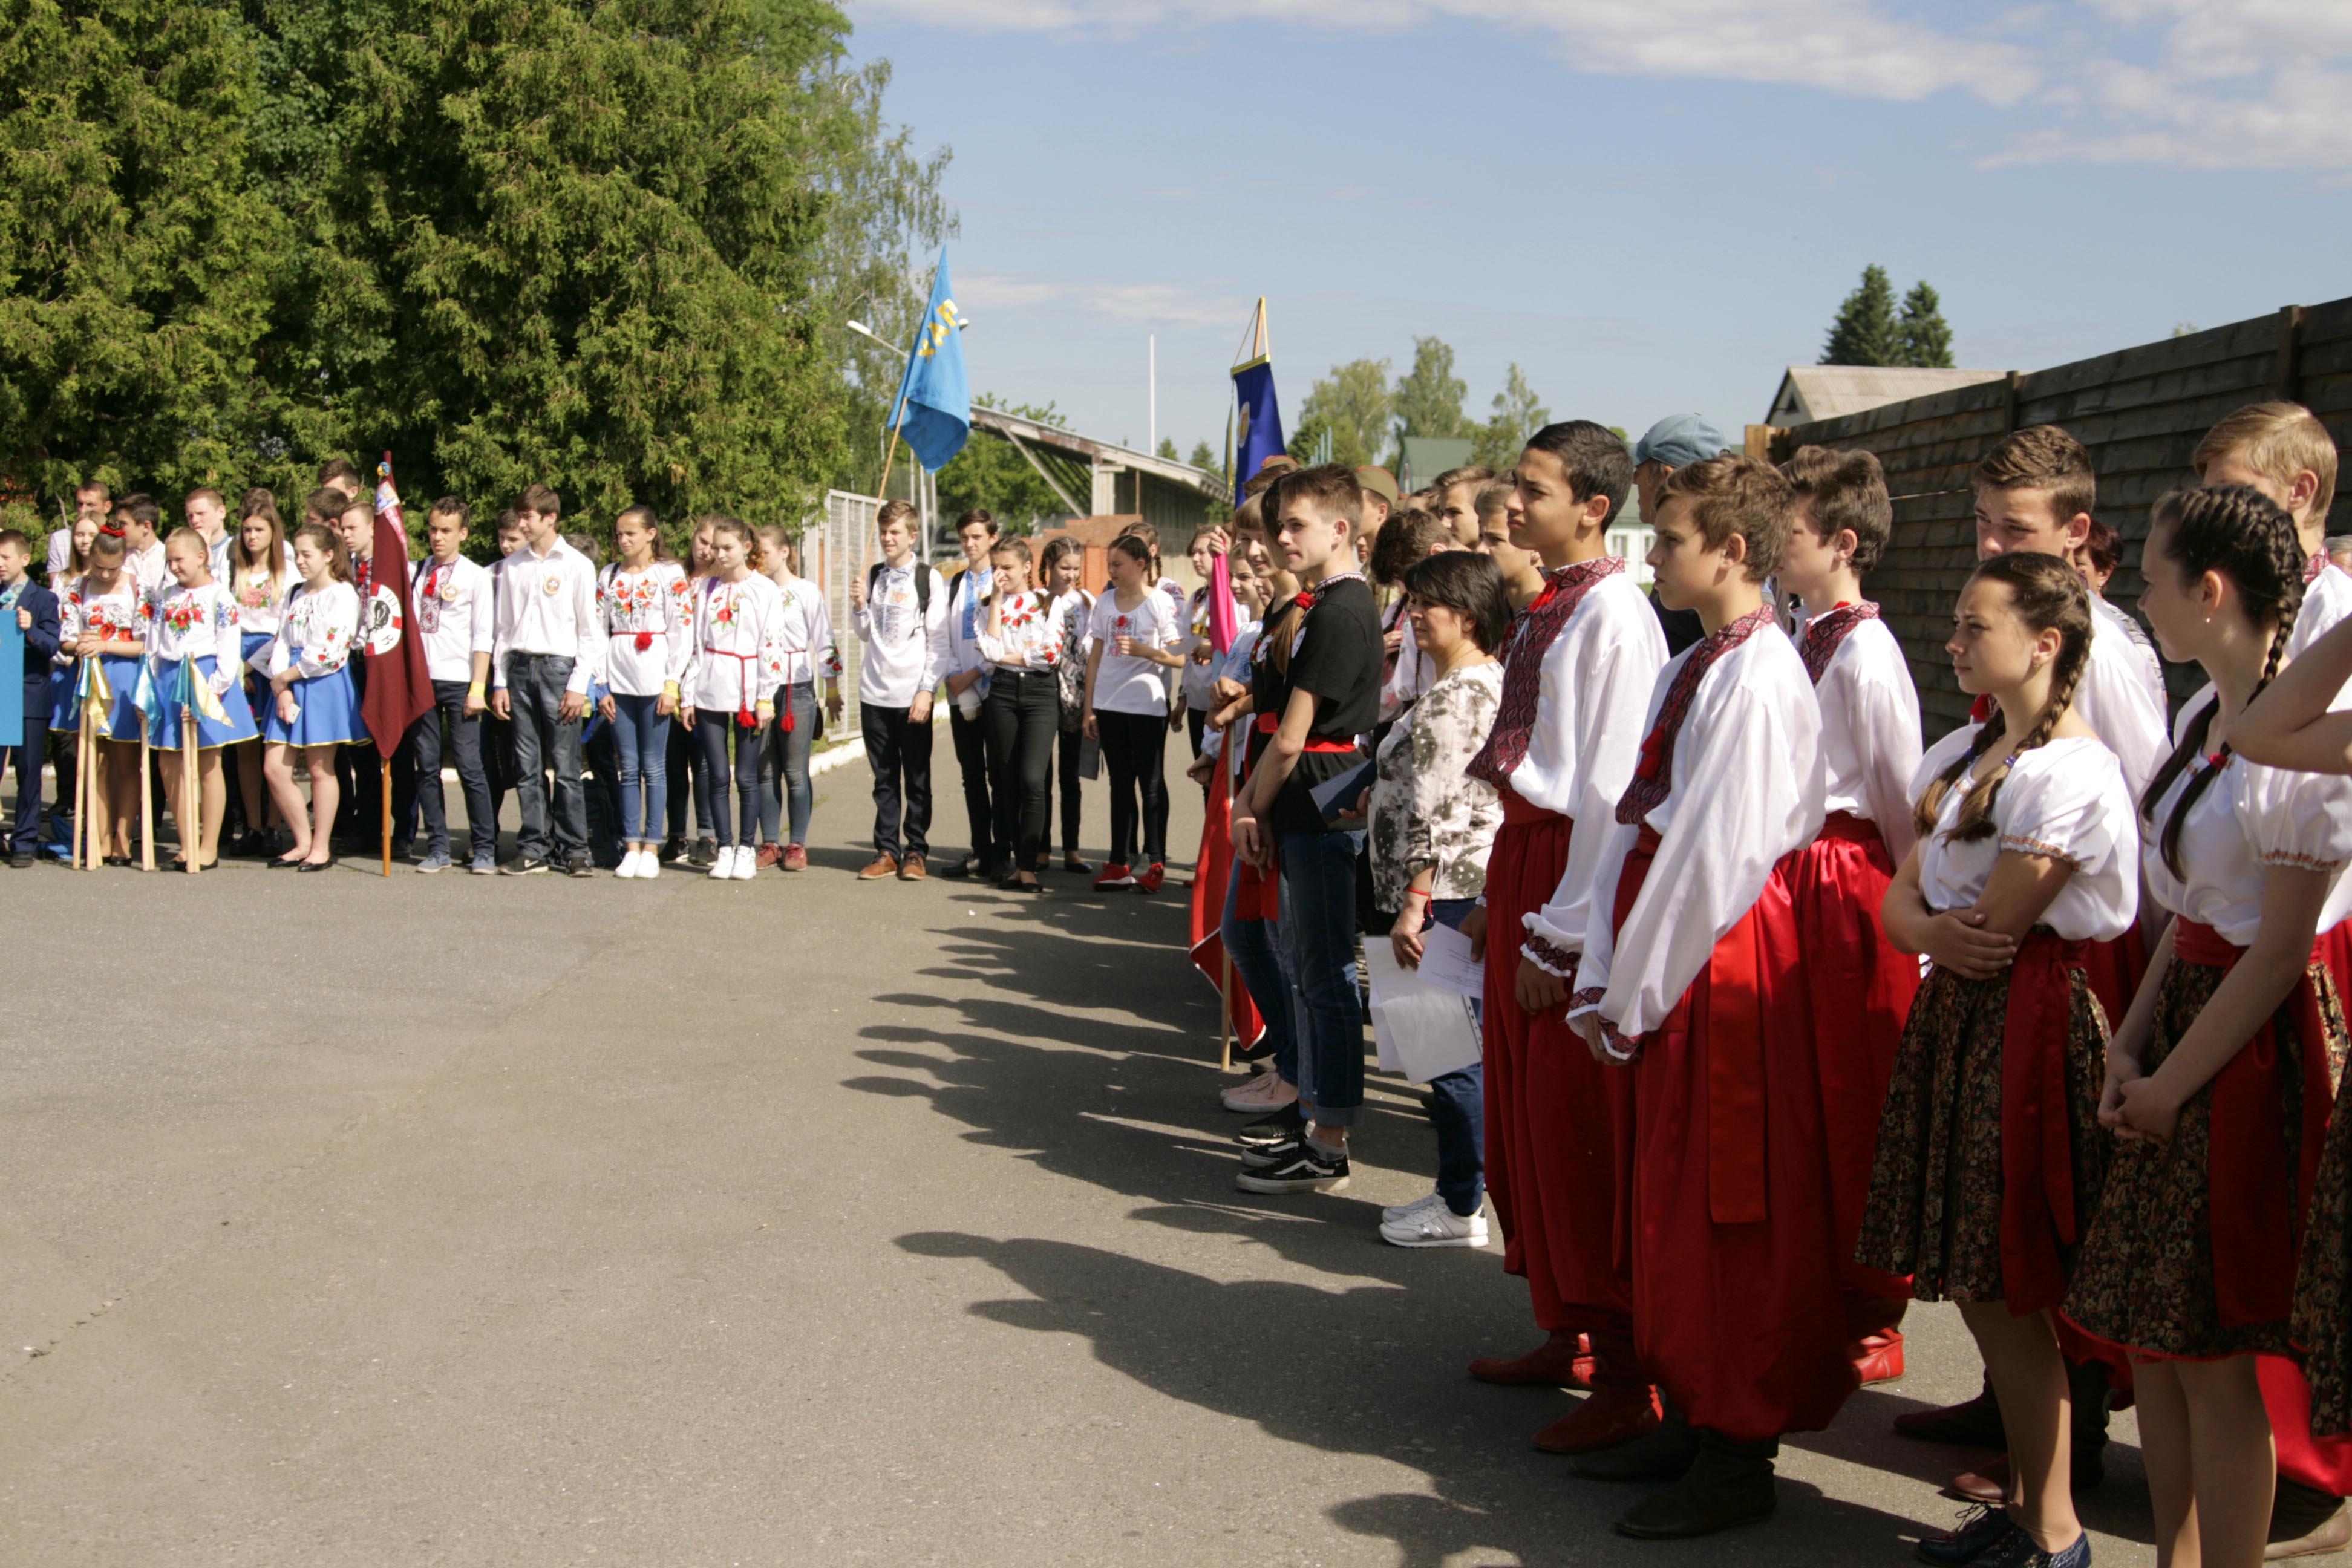 MG_2923 У Бородянці пройшла найбільша патріотична гра «Сокіл» (Джура)